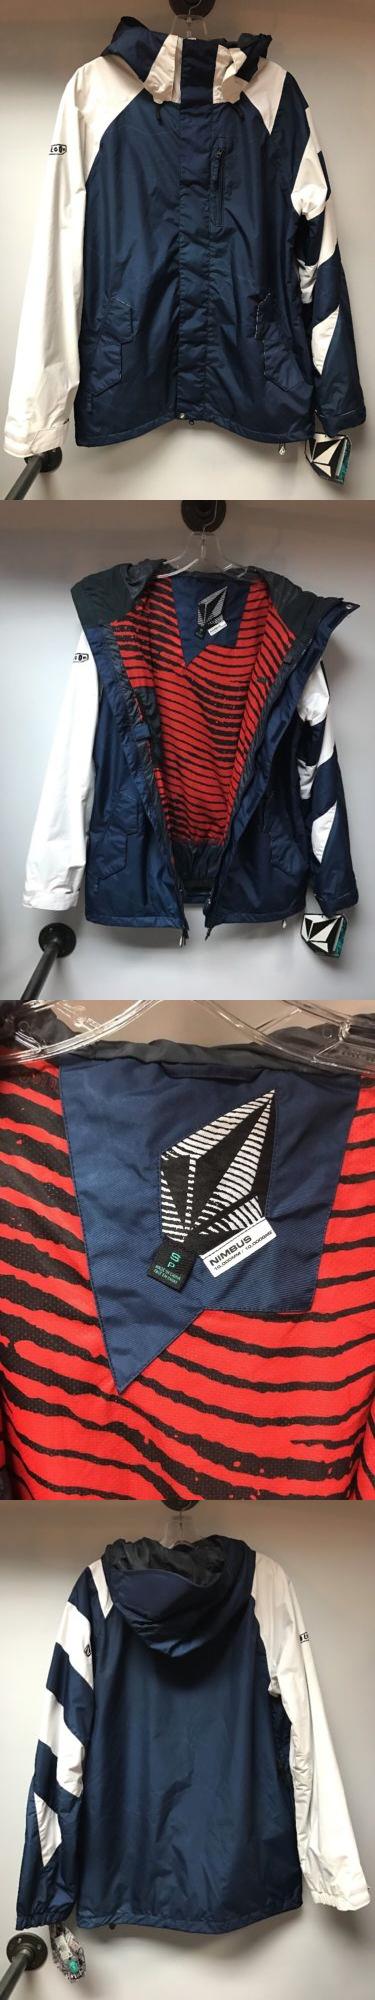 Coats and Jackets 26346: Volcom Singleton Jacket Fear Of The Dark Men S Small Snowboard Ski Winter -> BUY IT NOW ONLY: $76.45 on eBay!